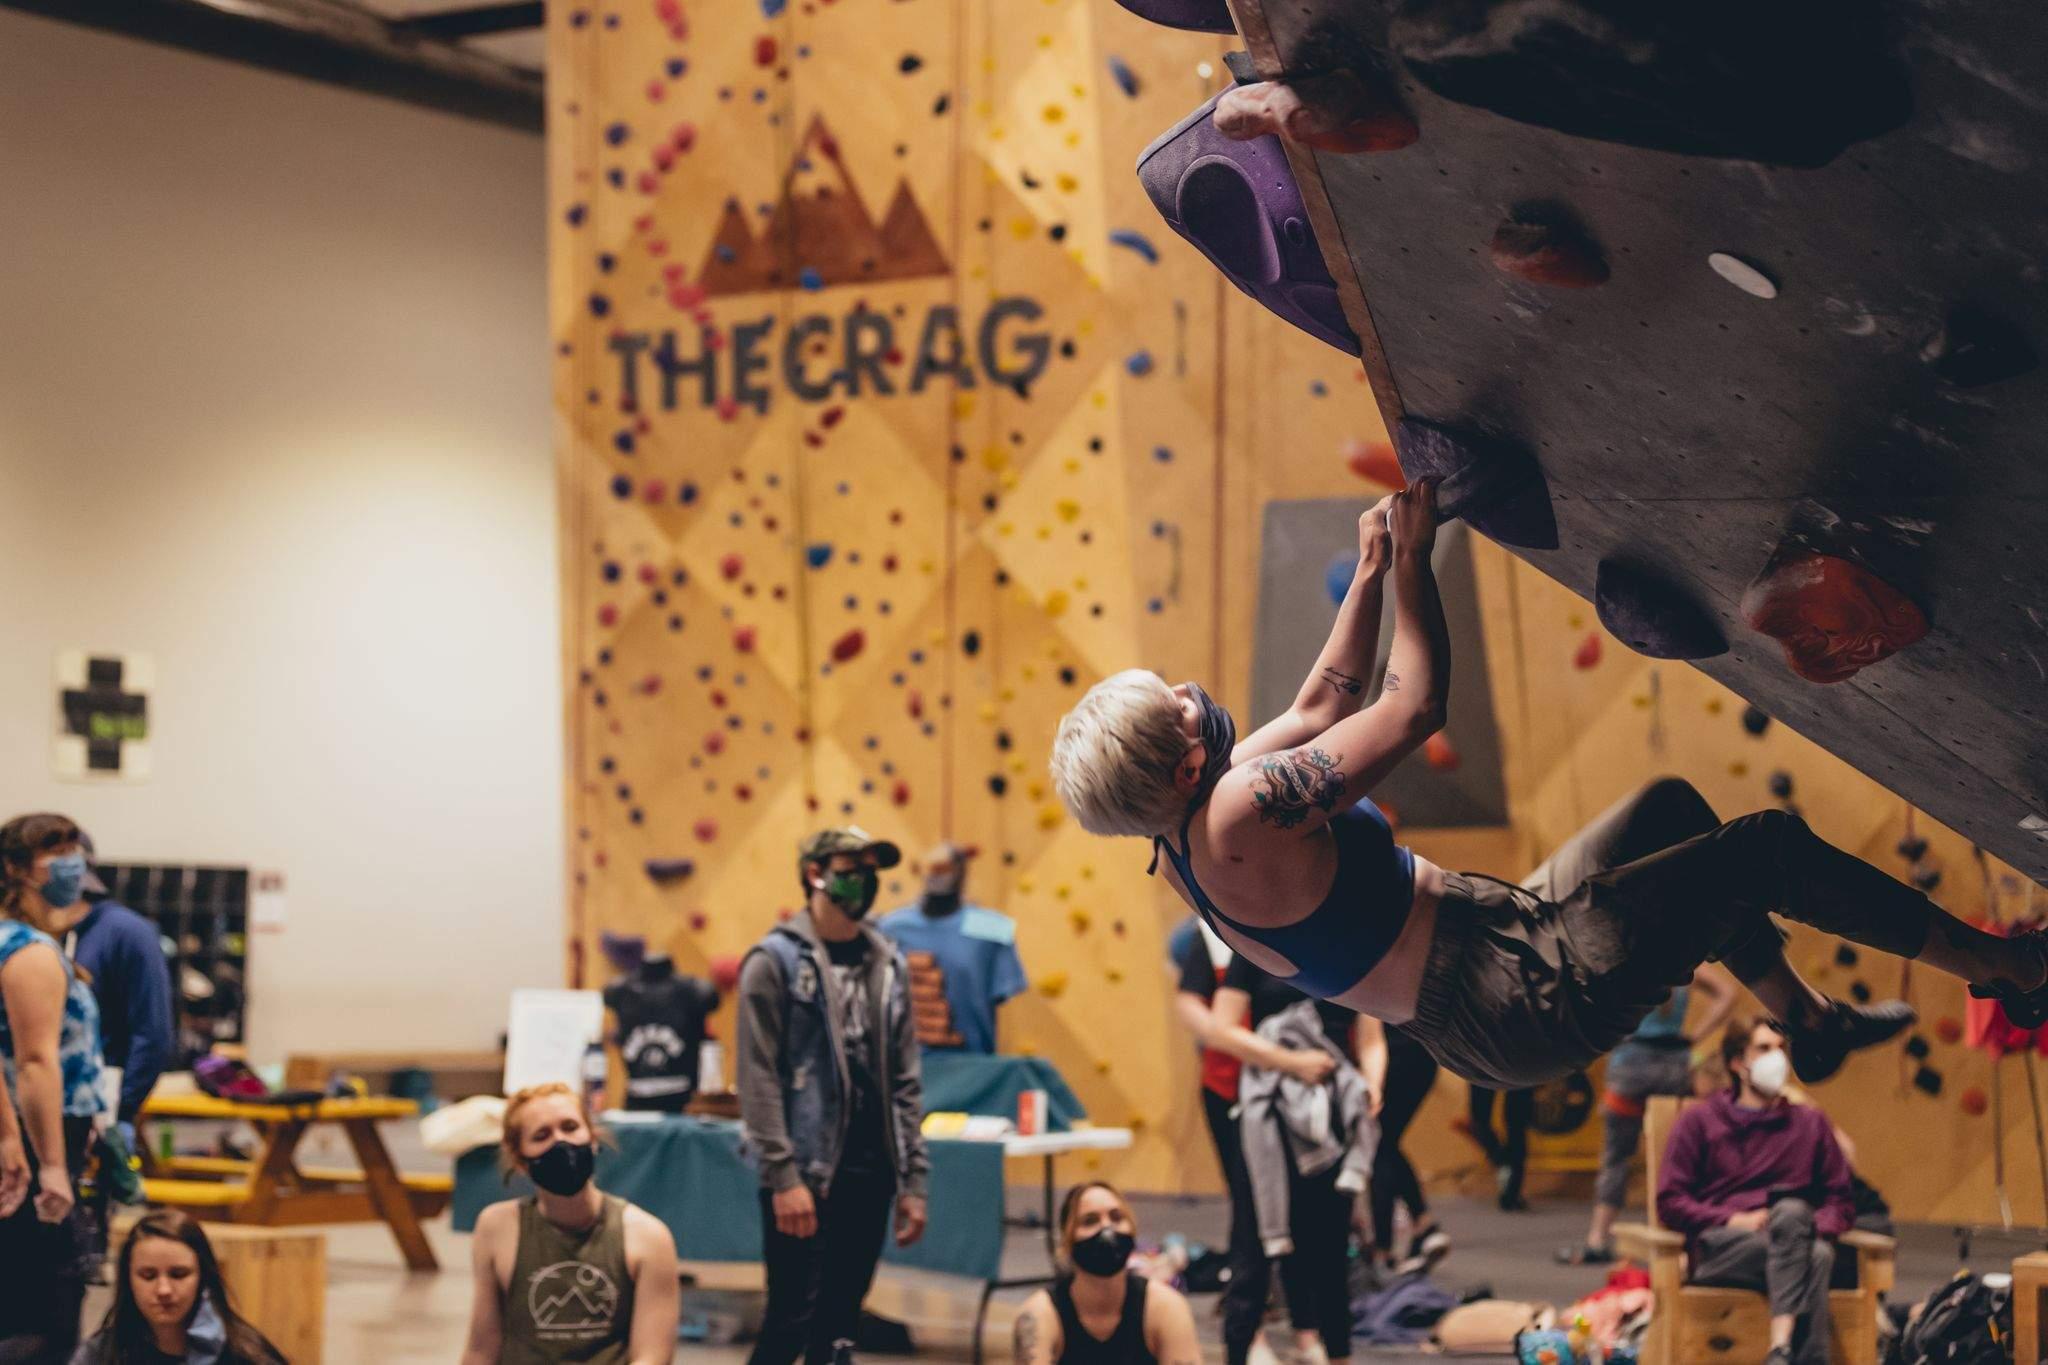 Woman rock climbing inside wearing mask